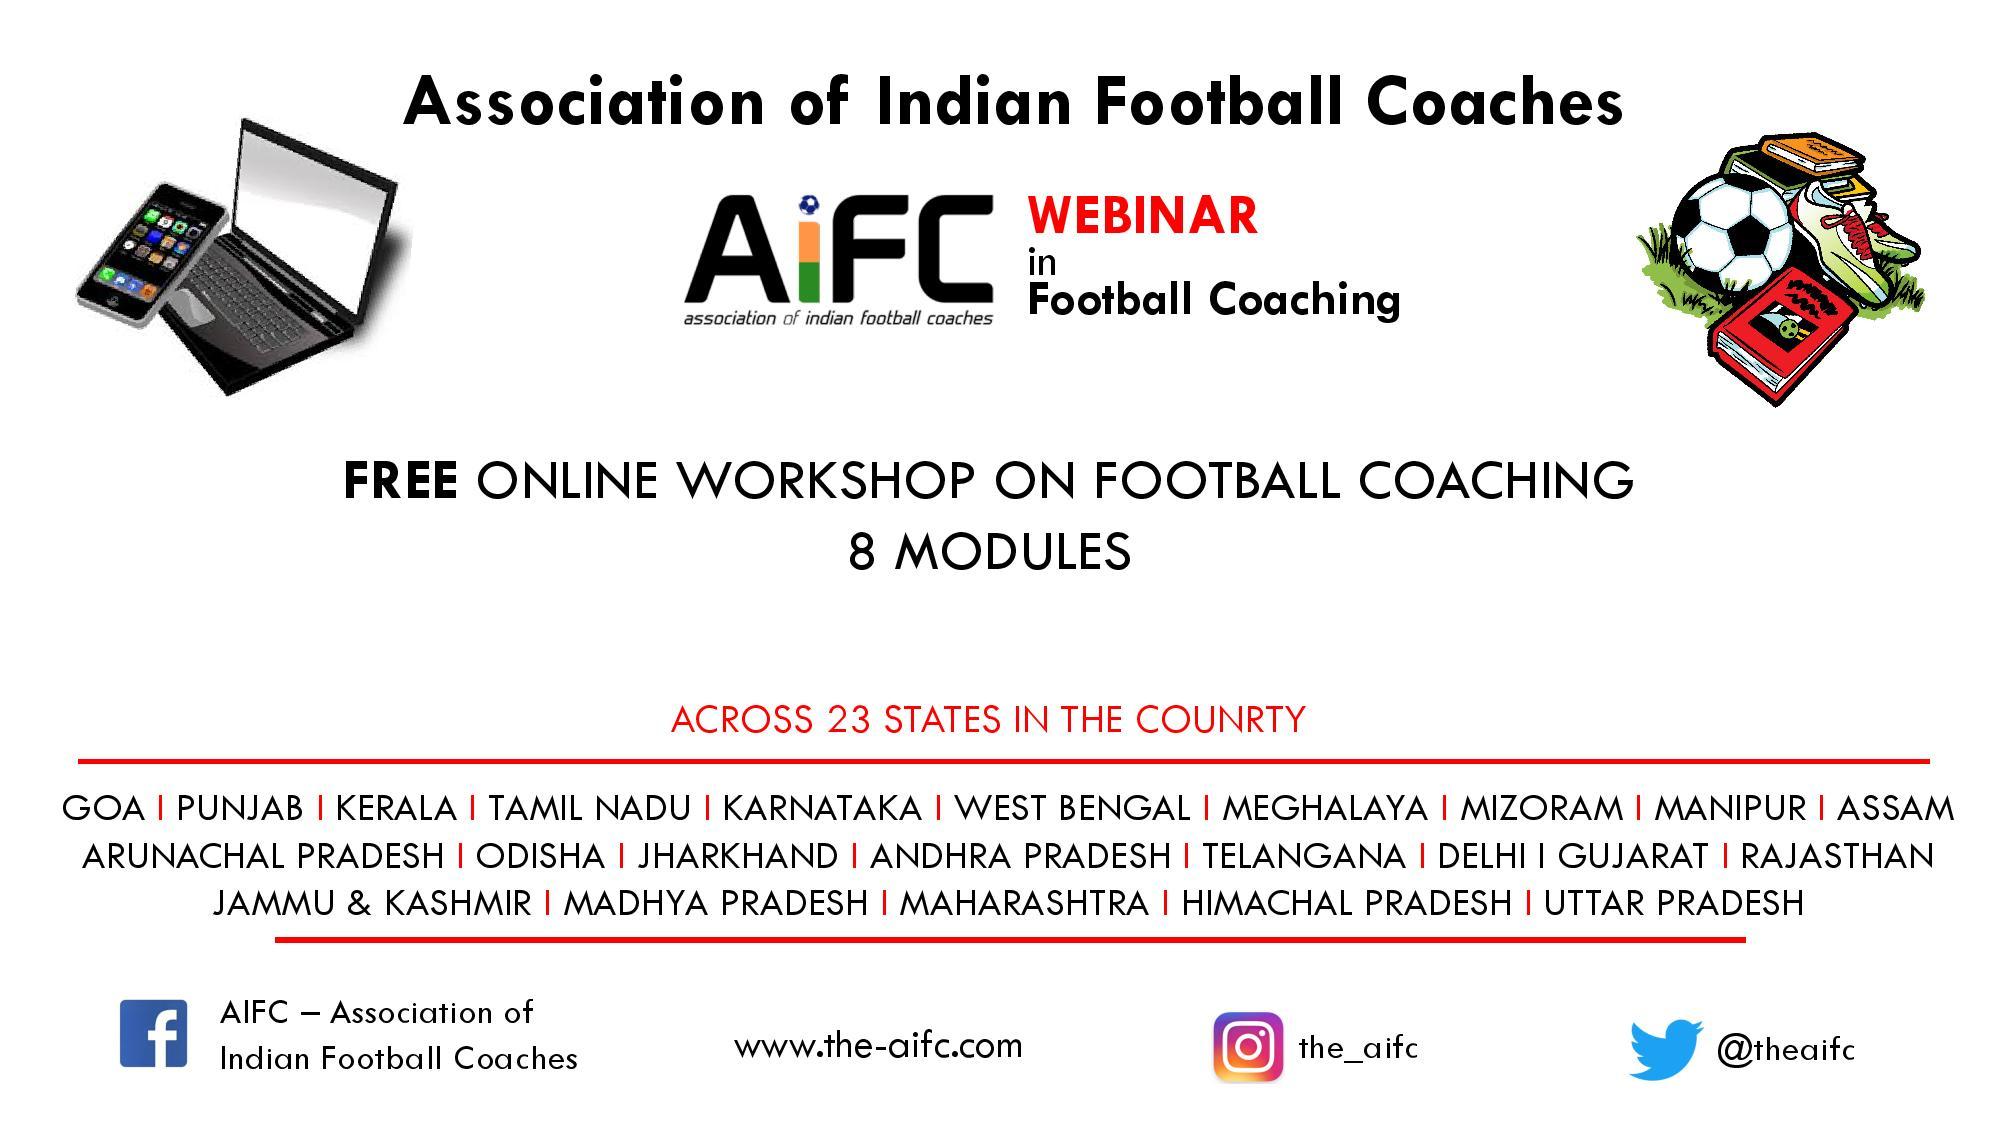 #AIFCWebinar in football coaching during pandemic – Photos